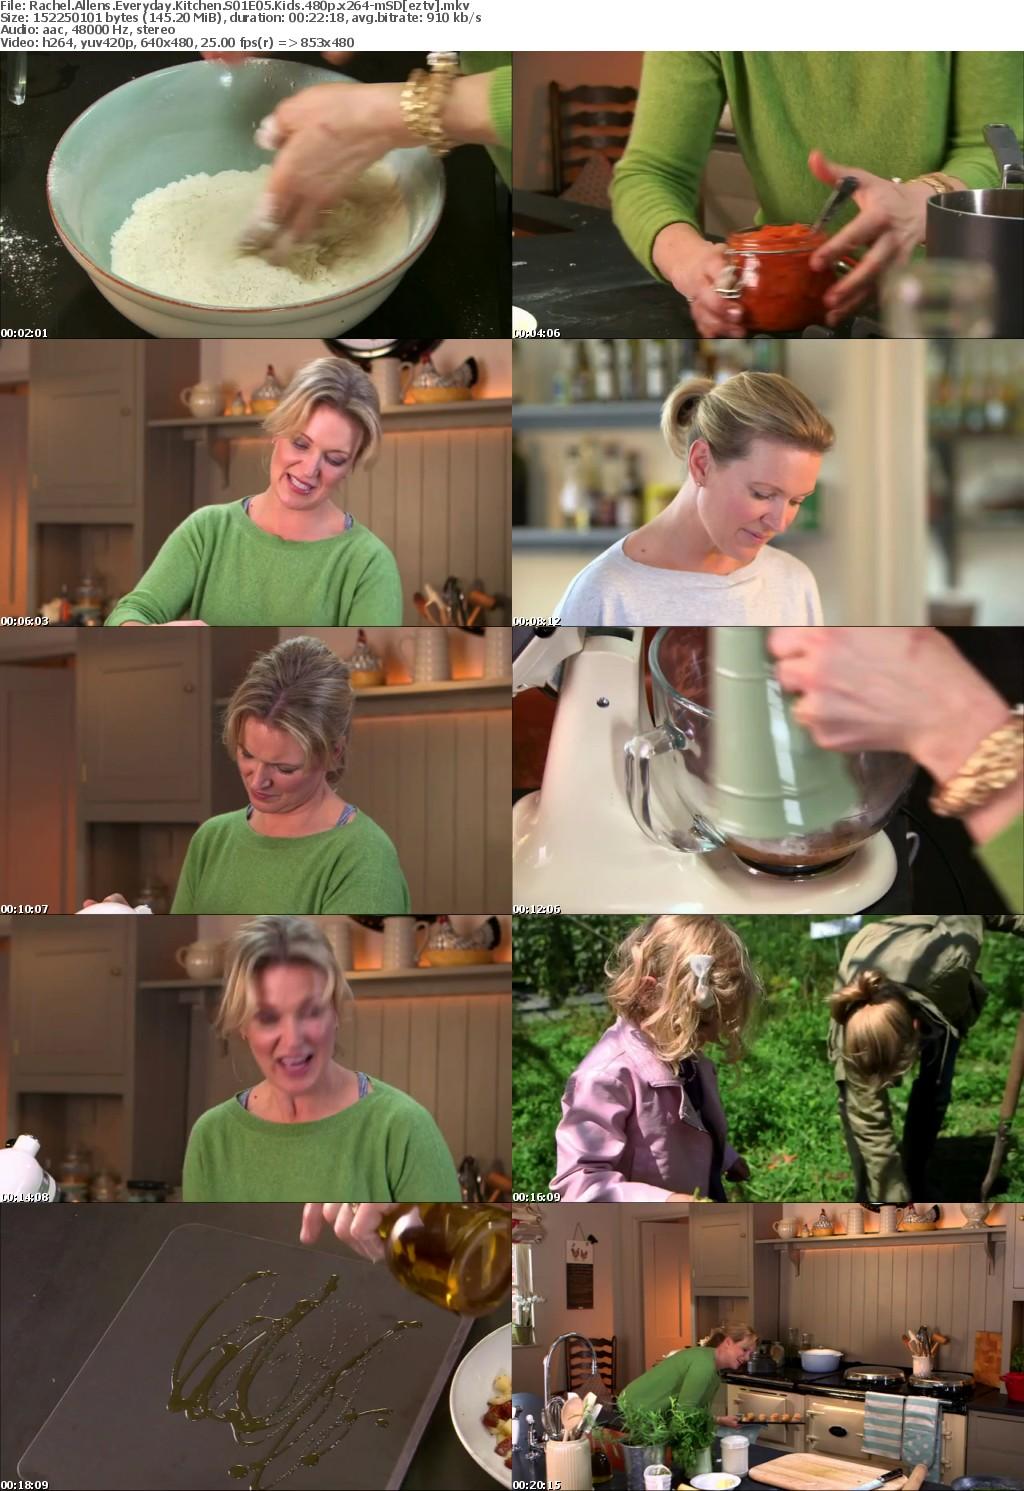 Rachel Allens Everyday Kitchen S01E05 Kids 480p x264-mSD